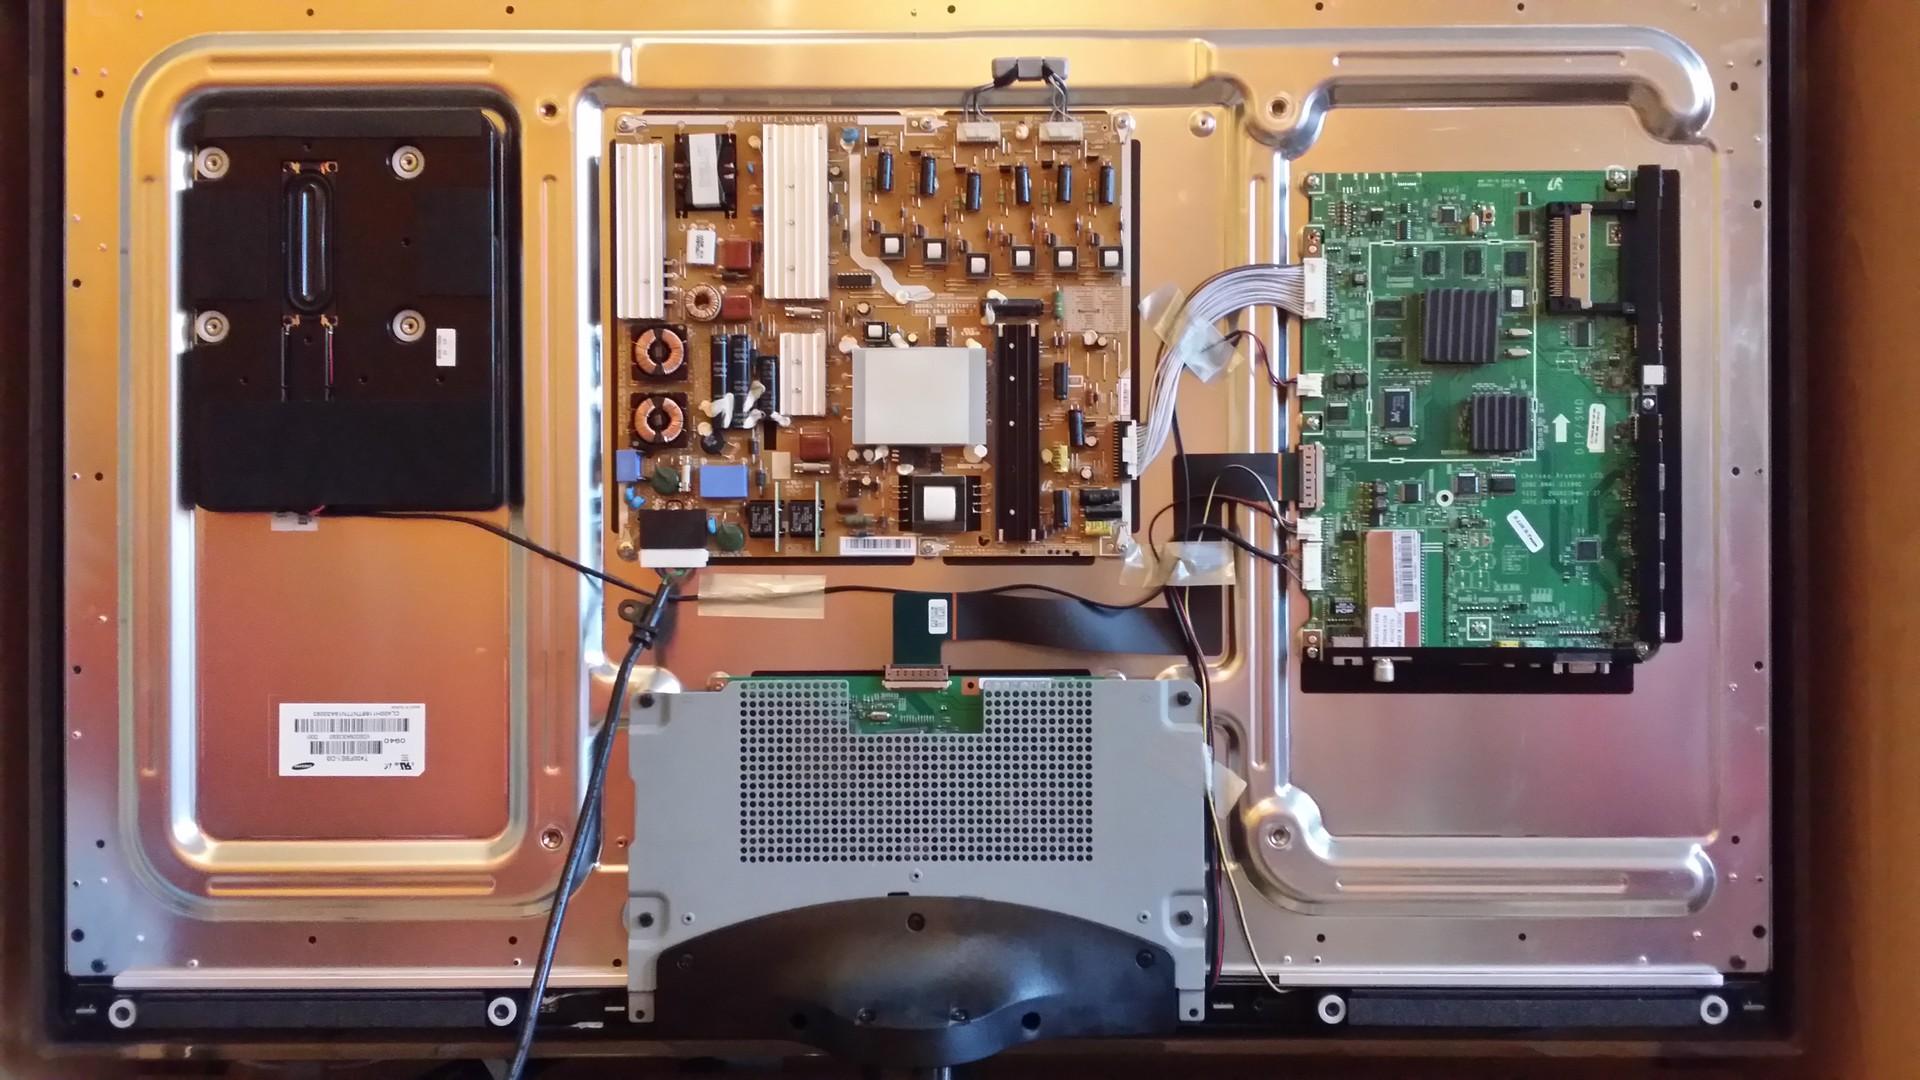 Samsung UE40B7090WP  samsung, ue40b7090wp  hififorumde